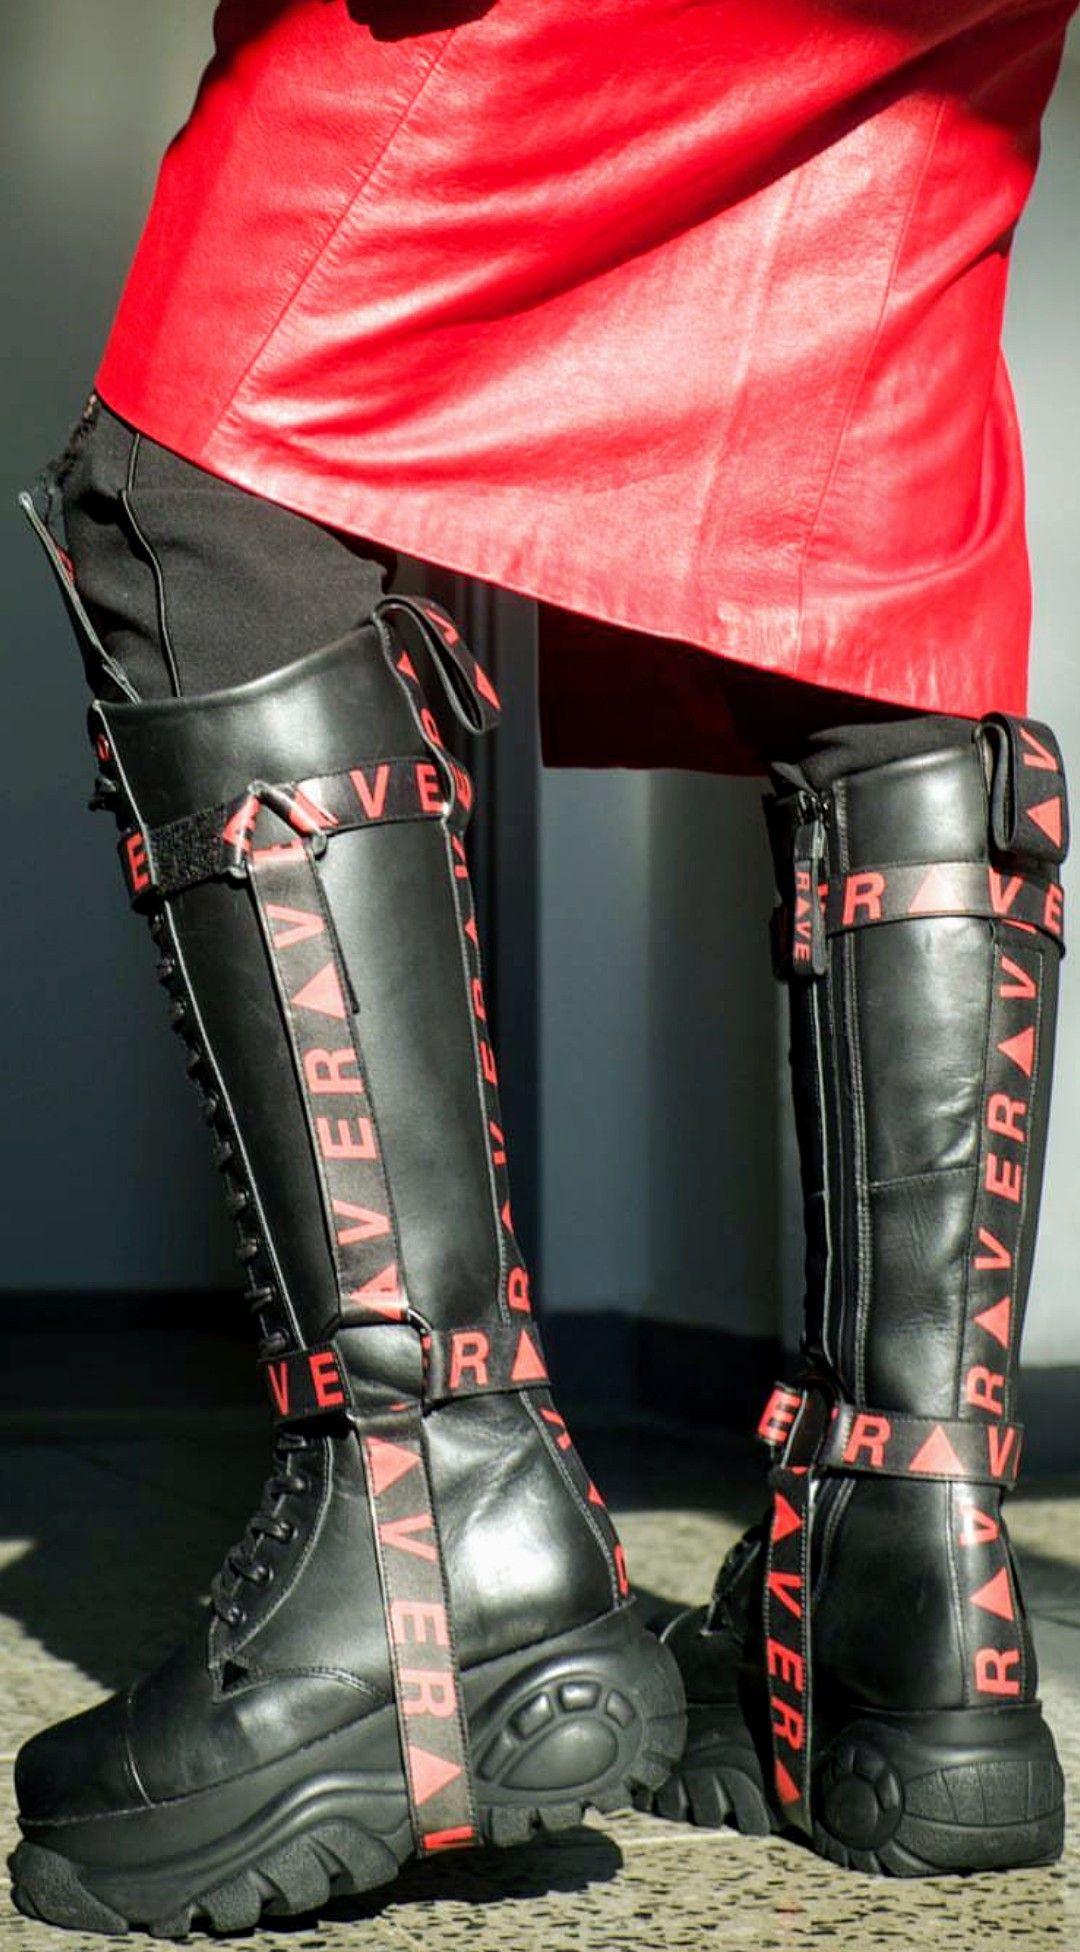 c4db31e476 A stunning new collaboration between Buffalo London and German footwear  designer Patrick Mohr!